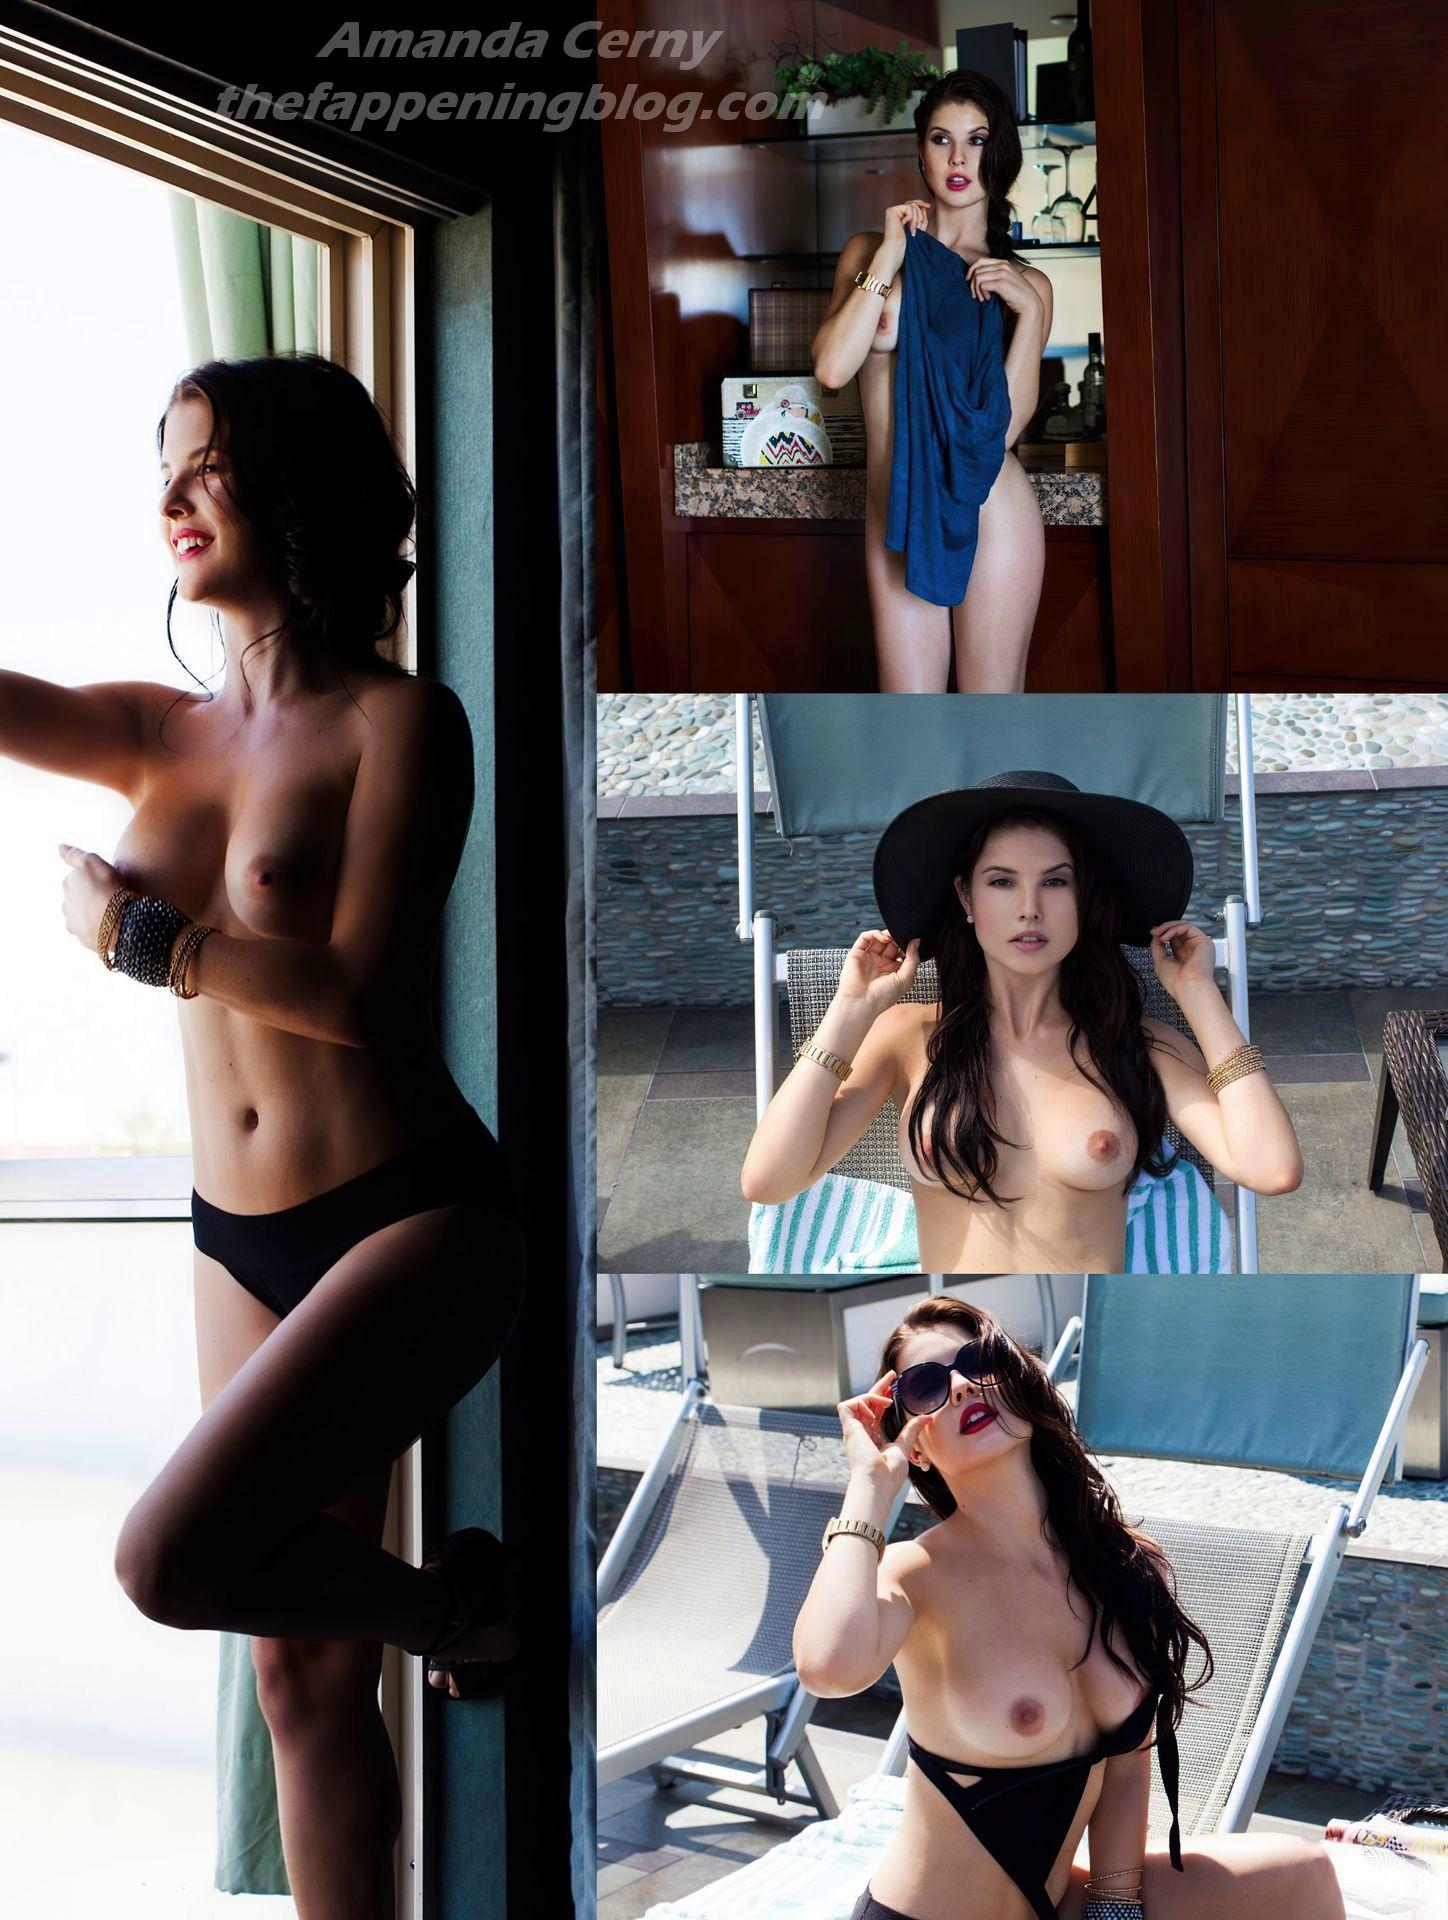 Amanda Cerny Nipples : amanda, cerny, nipples, Amanda, Cerny, Photos, #TheFappening